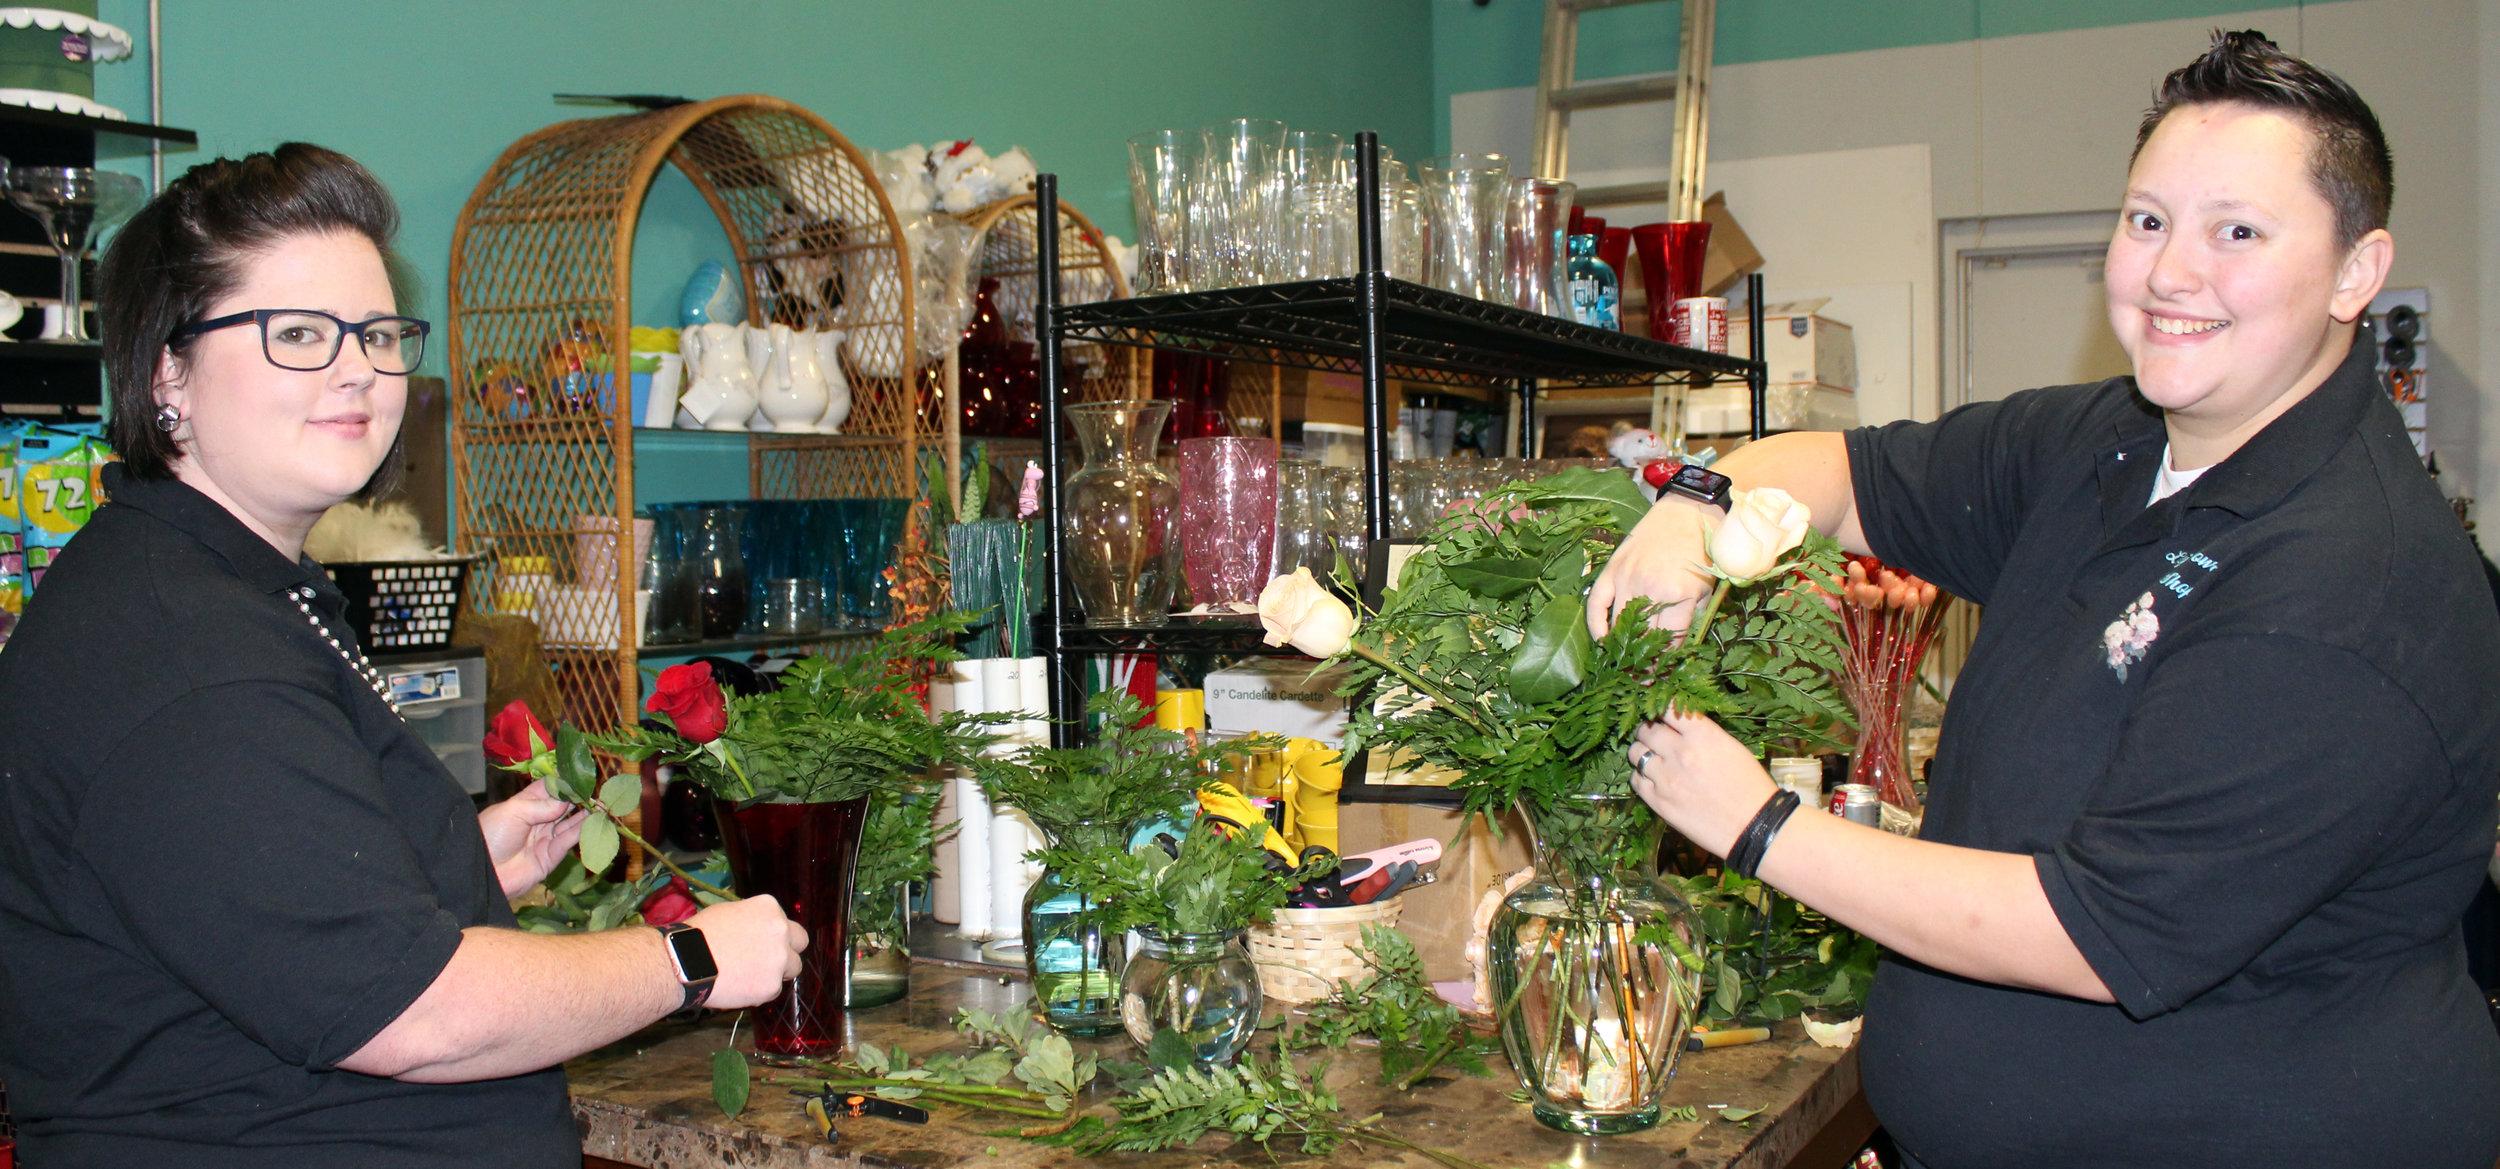 lovejoy flower arrangements.jpg